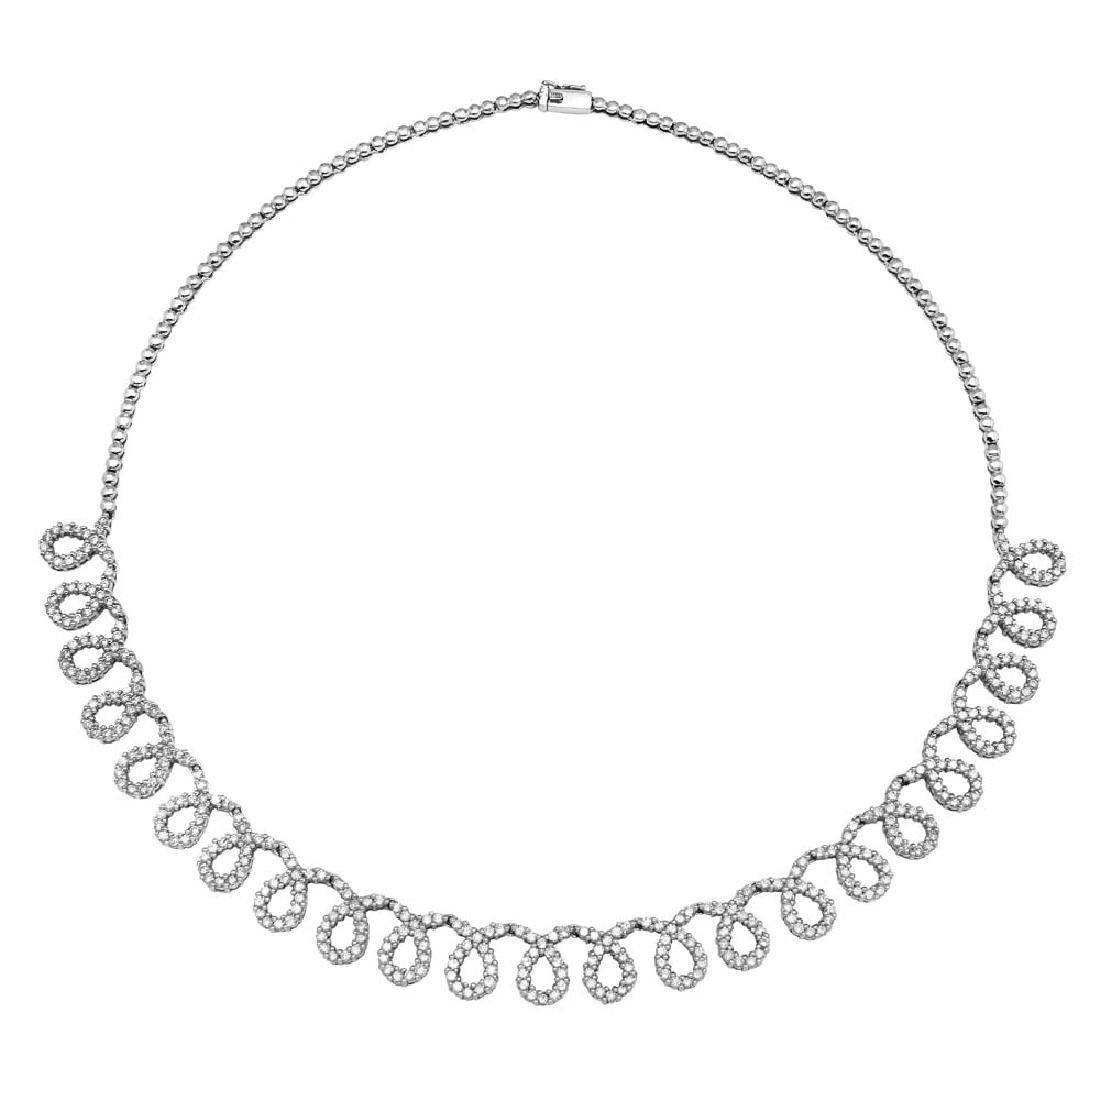 Genuine 5.03 TCW 14K White Gold Ladies Necklace